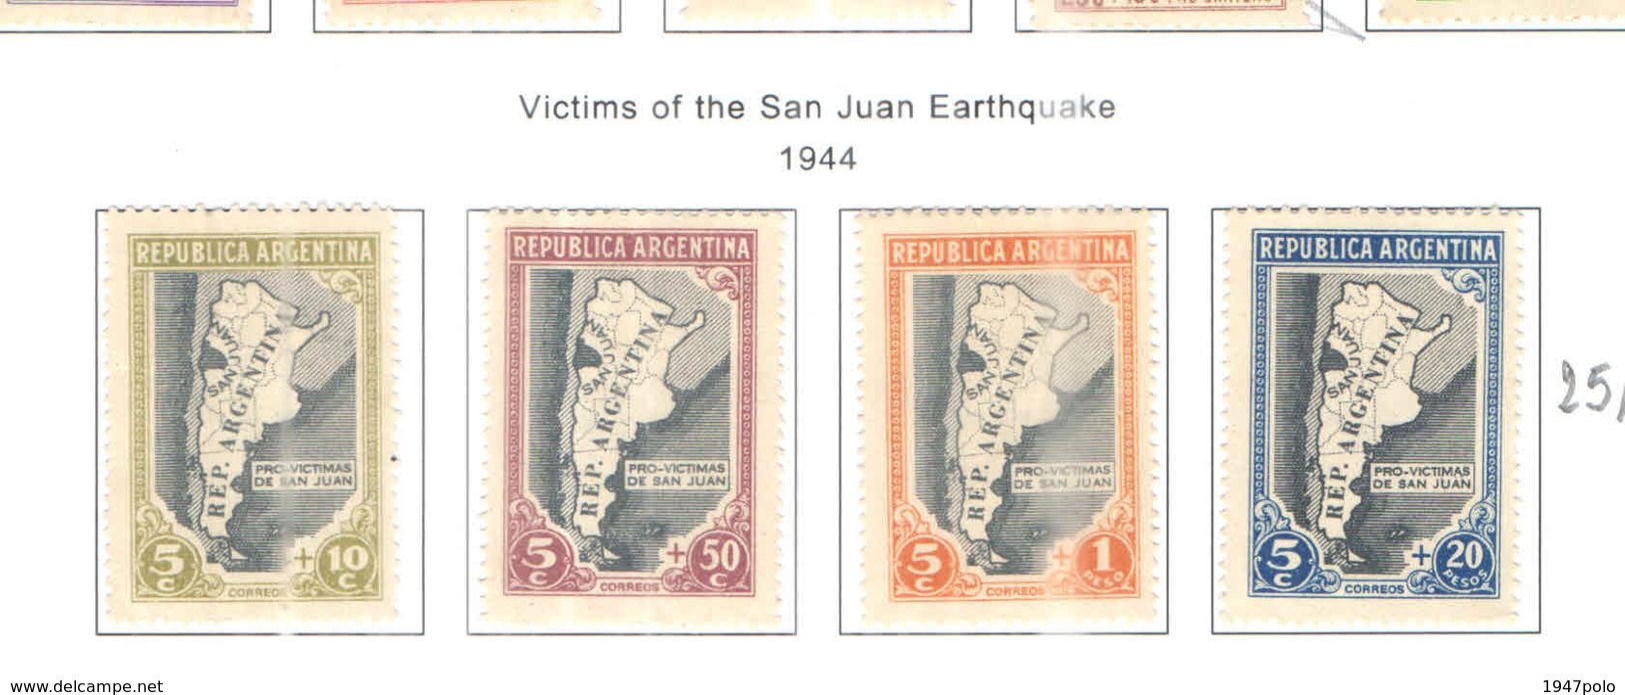 Argentina POSP 1944 Vittime San Juan Earthquake  Scott.B6/9 New See Scan On Scott.Page - Argentina